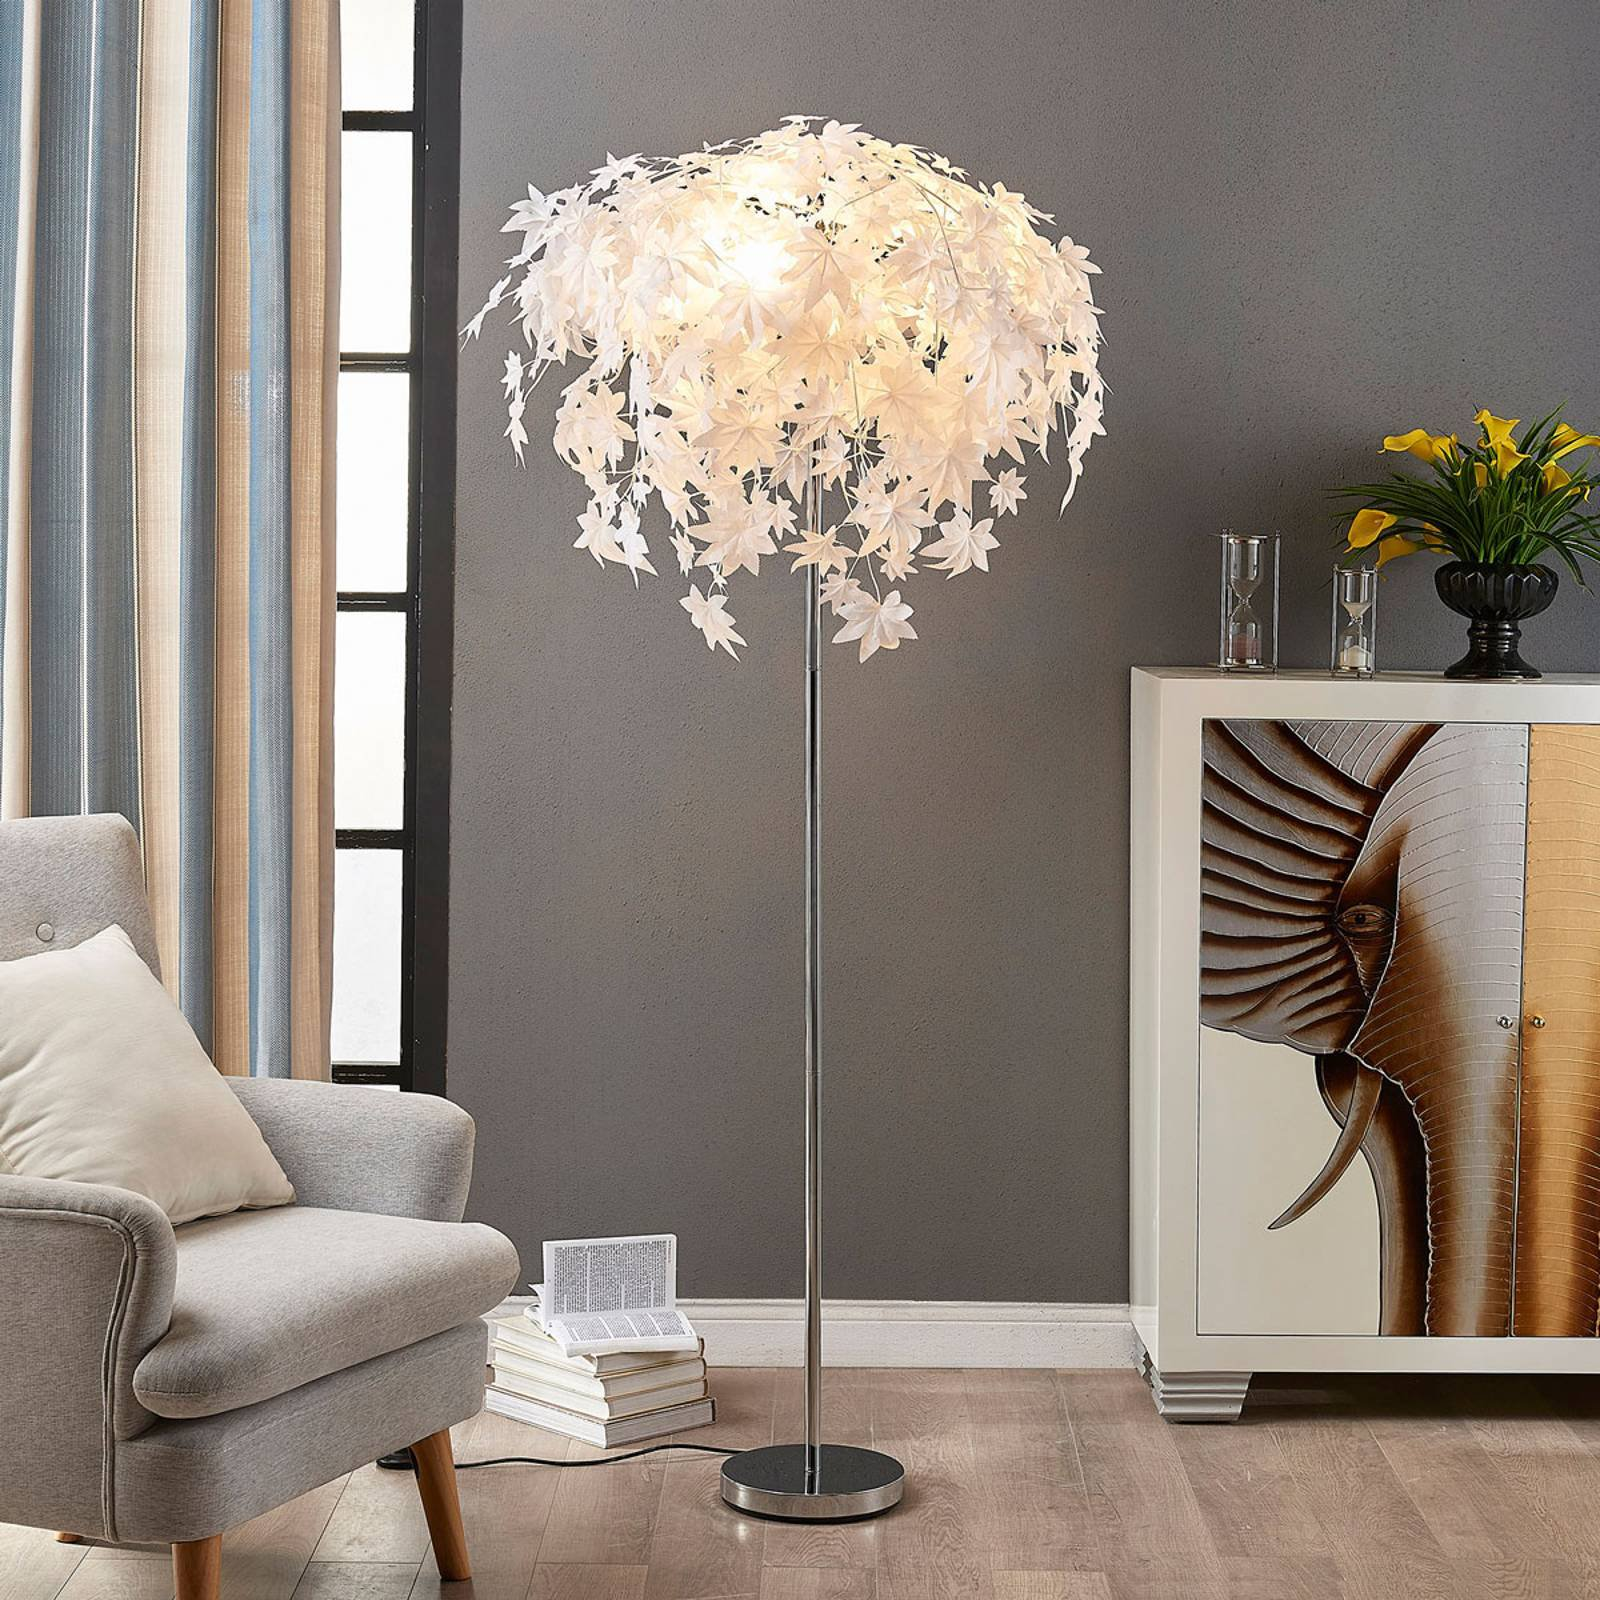 Maple - gulvlampe med bladdekor